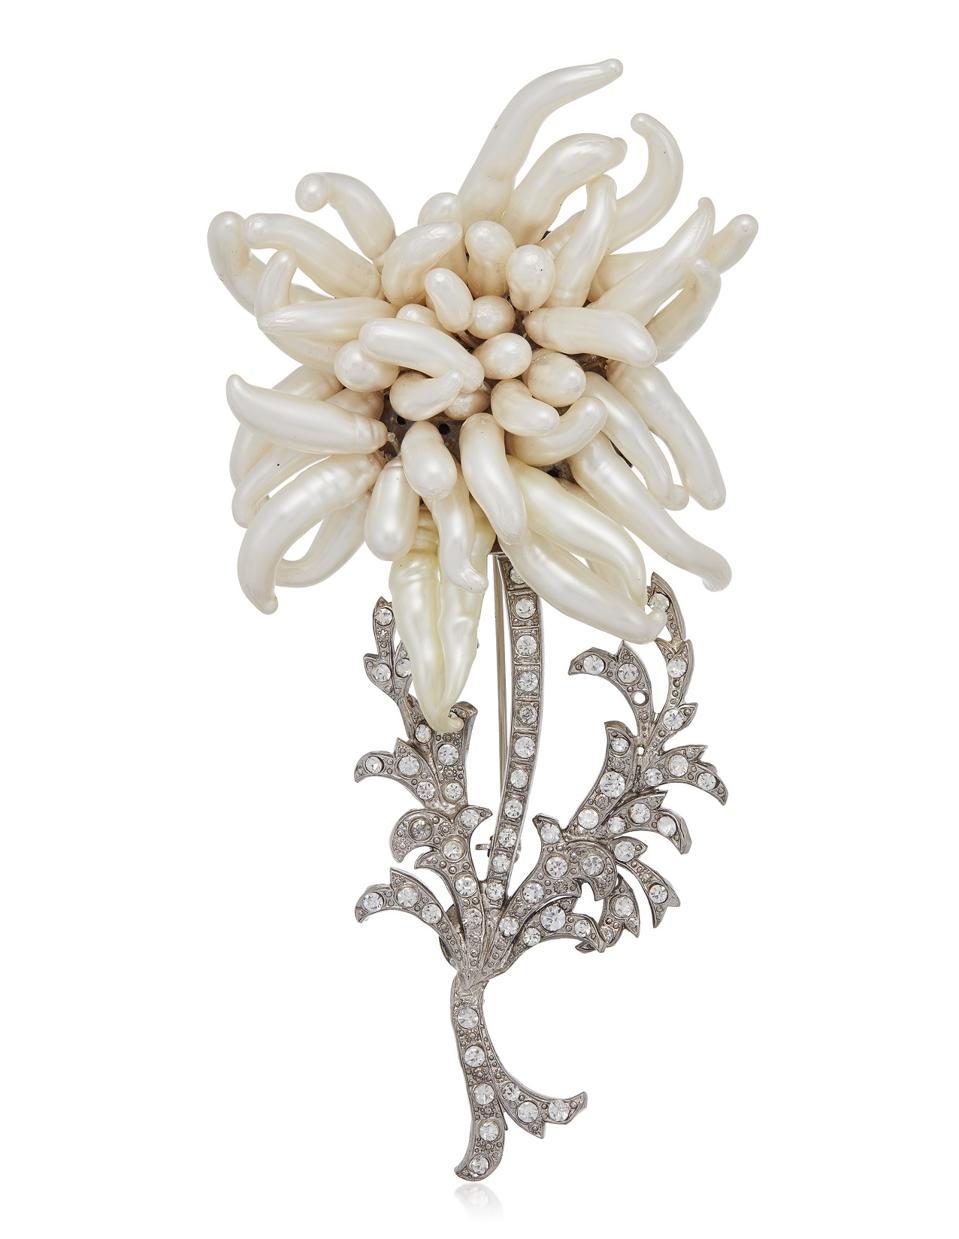 Chanel faux pearl and rhinestone brooch, $2,000 - $3,000